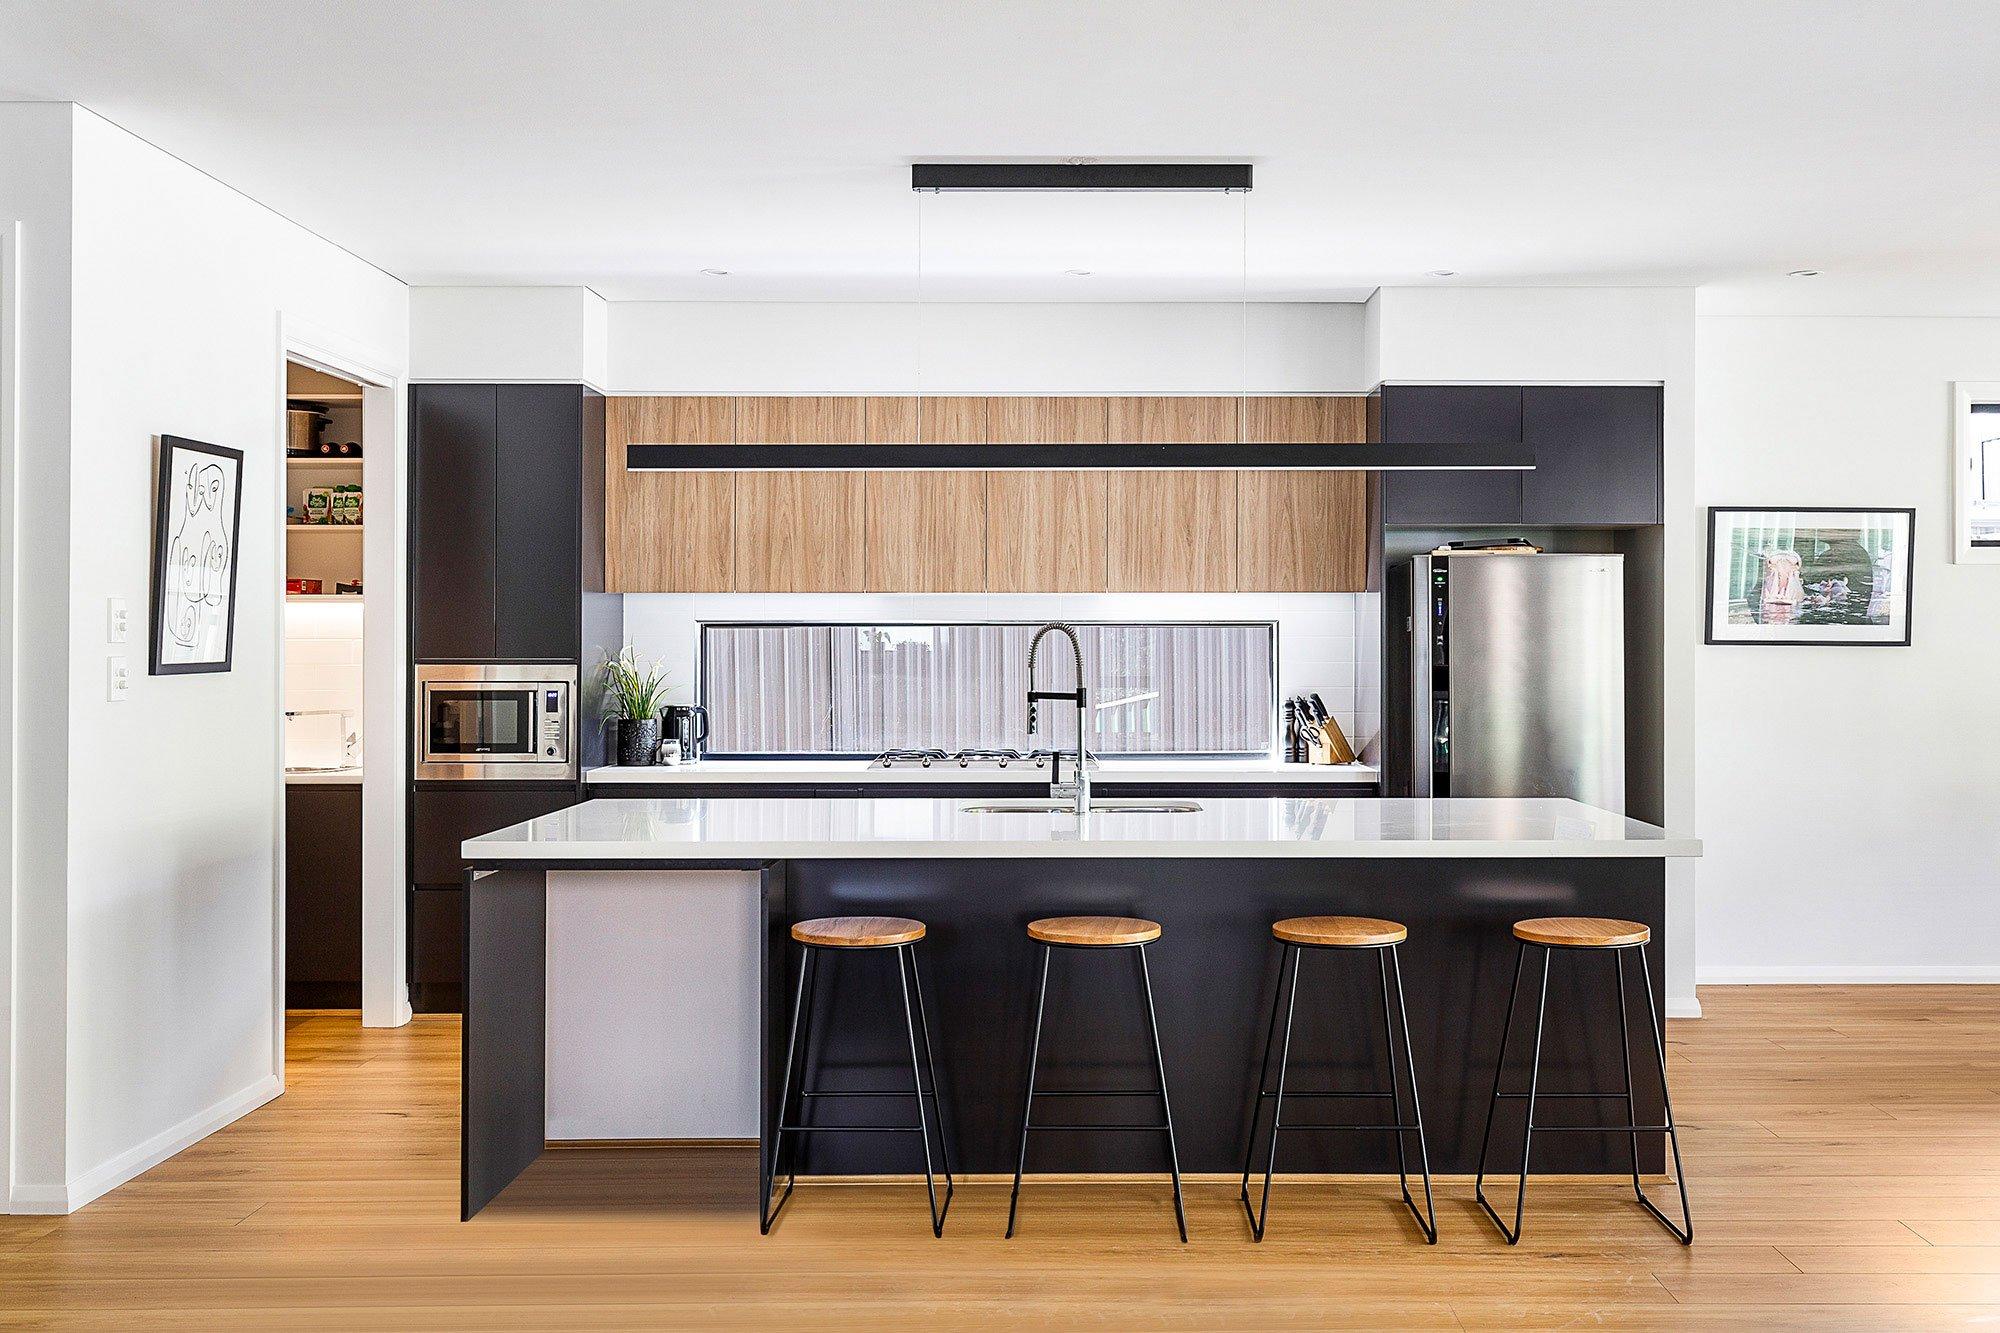 hallharthomes-kitchen-001-2000x1333